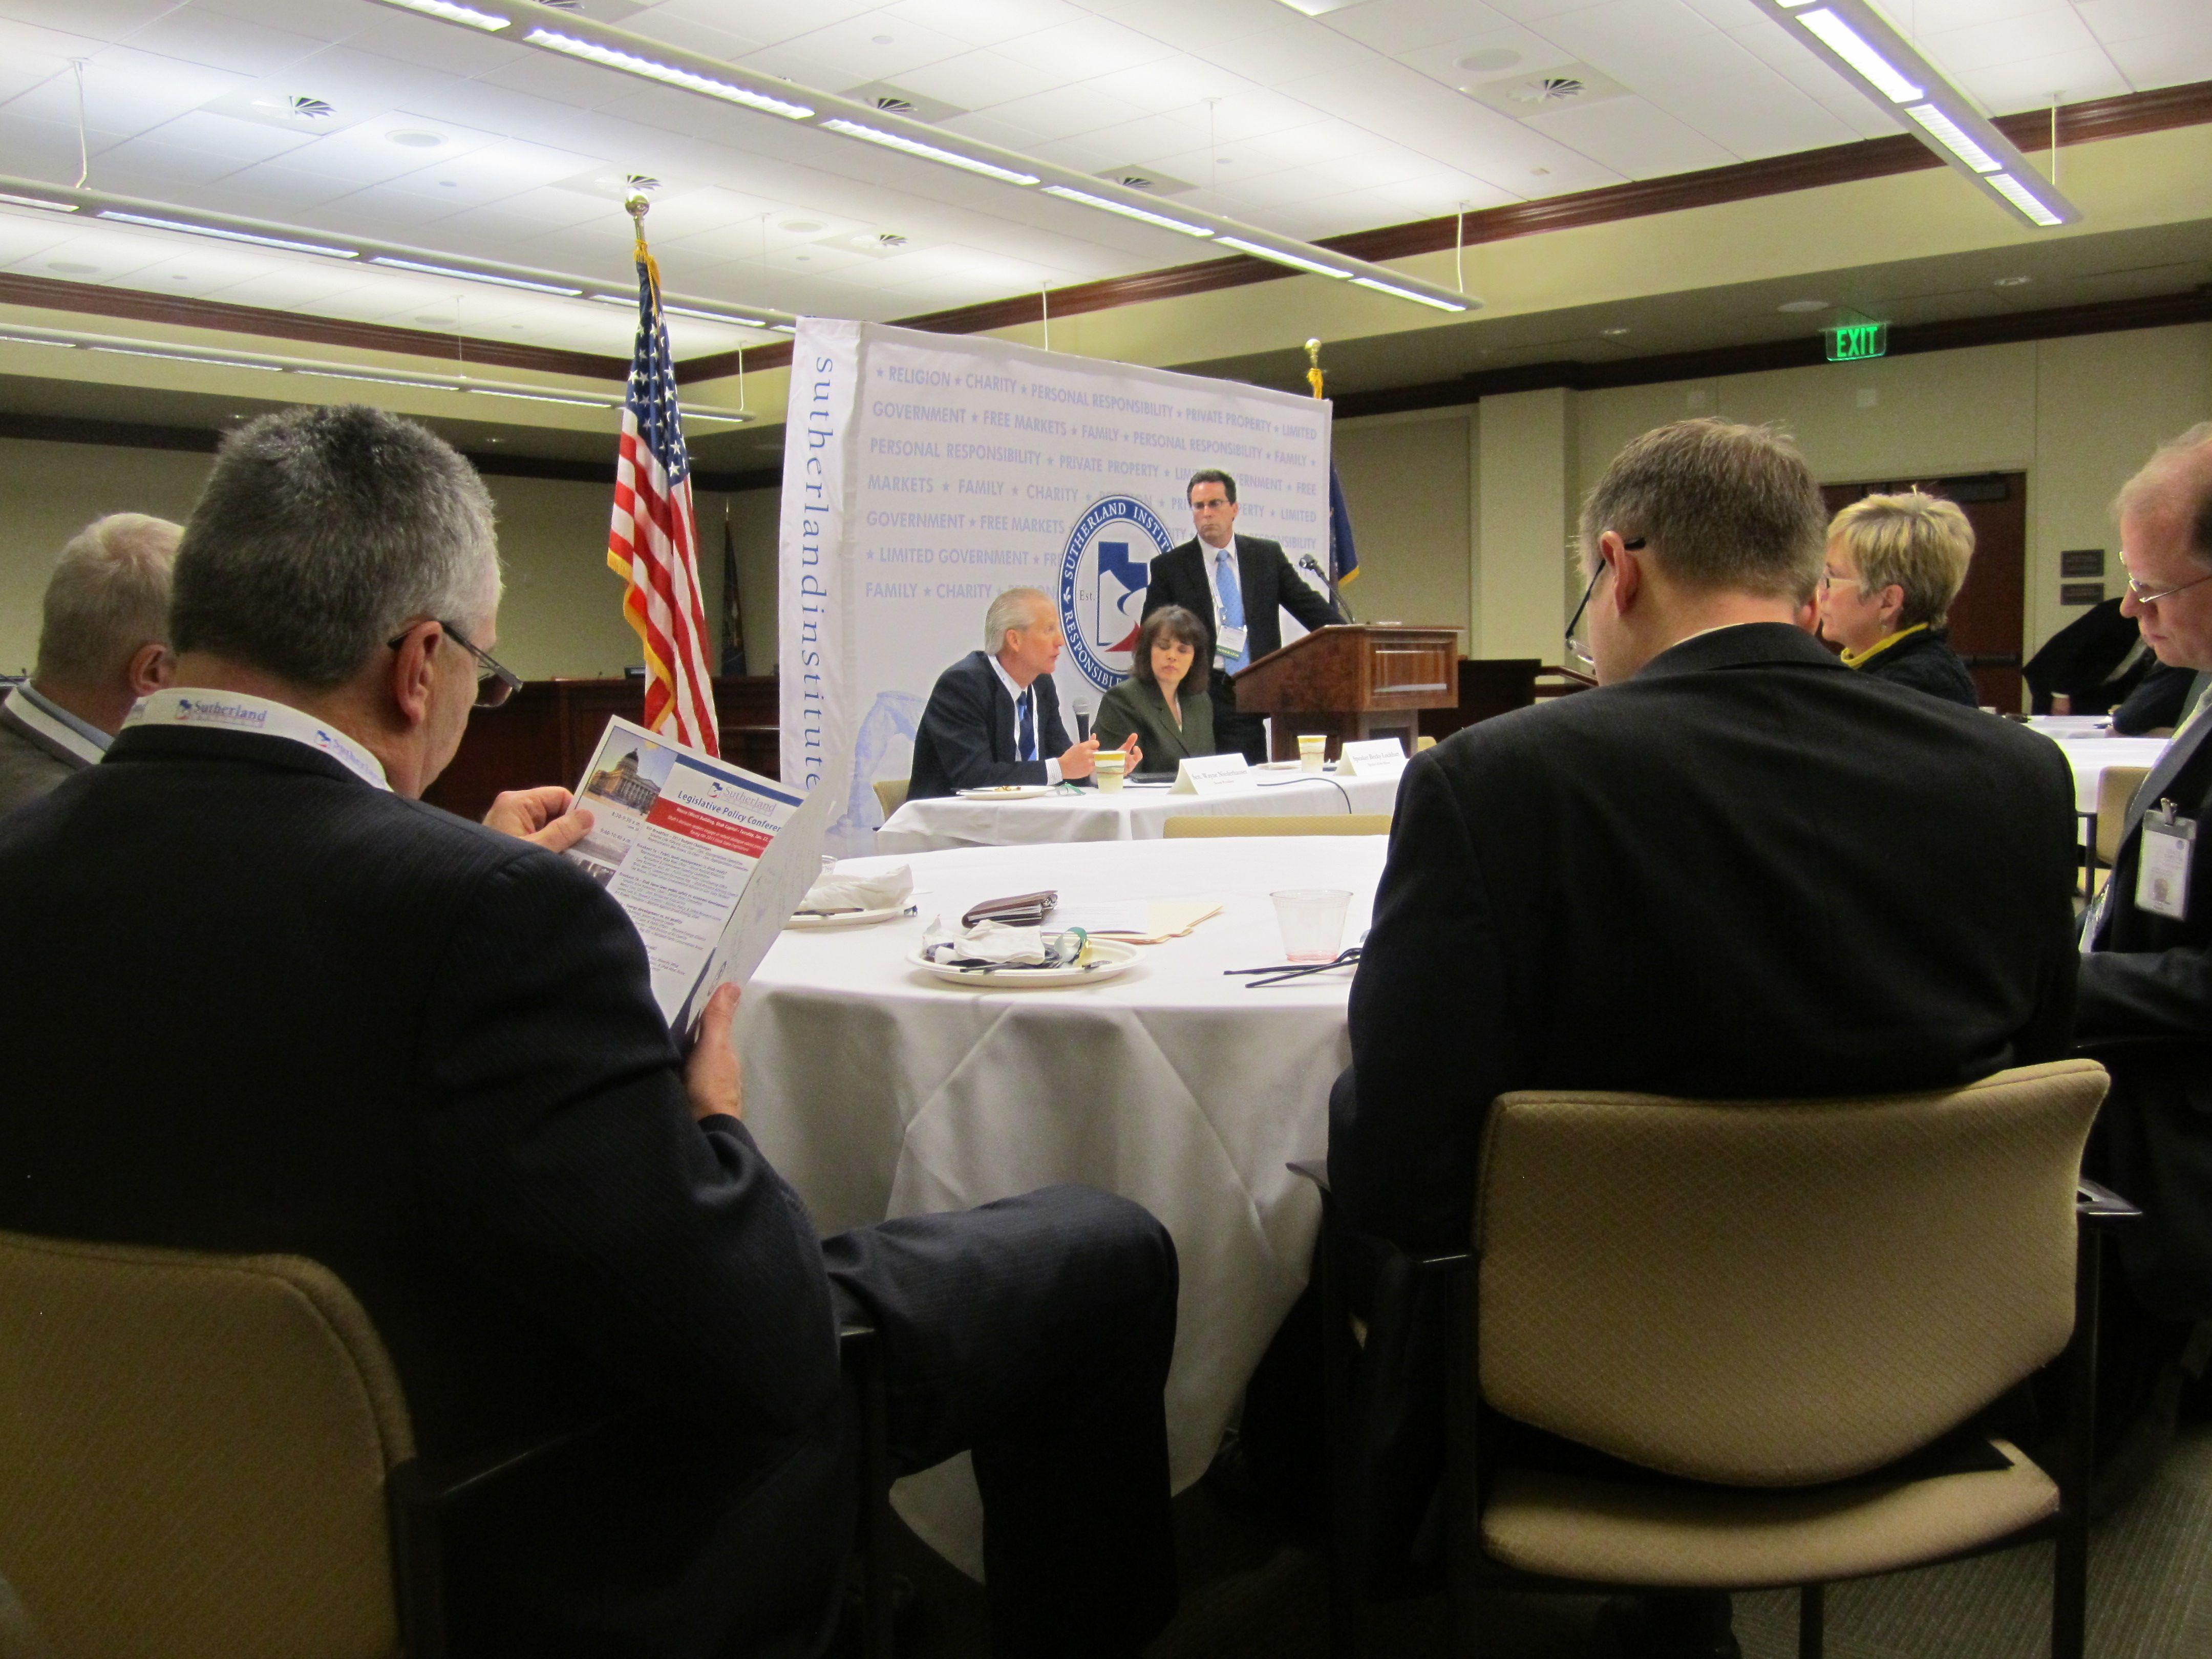 Senate President Wayne Niederhauser And Speaker Of The House Rebecca Lockhart Give A Legislative Preview By Answeri Senate This Or That Questions Legislature